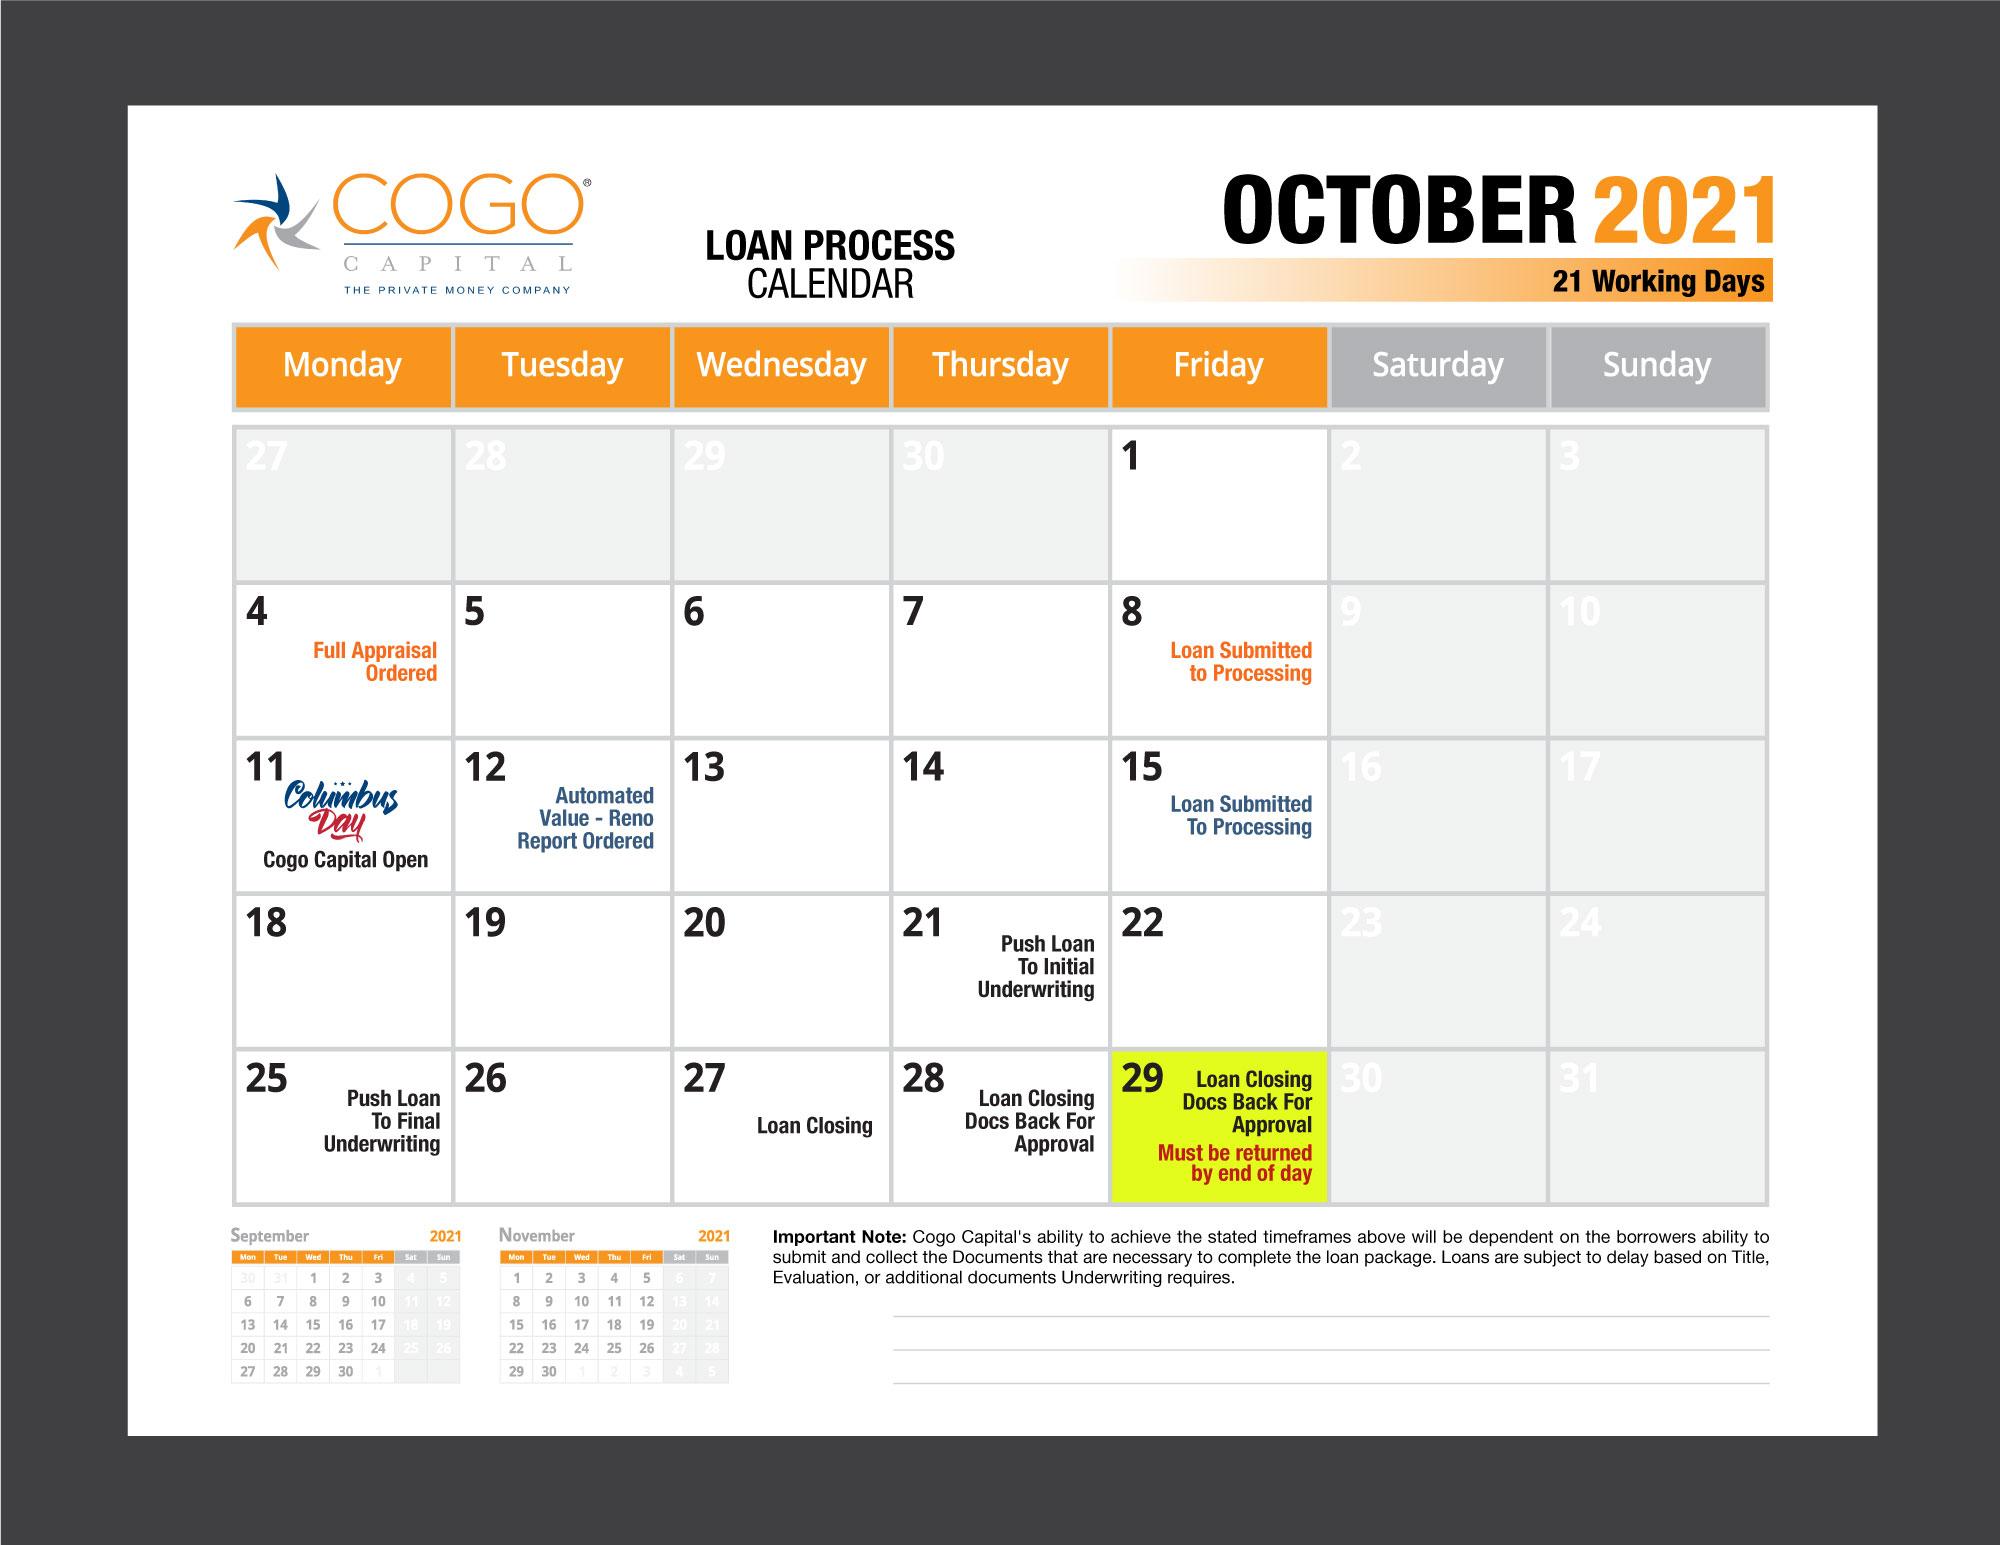 Cogo Loan Process Calendar - October